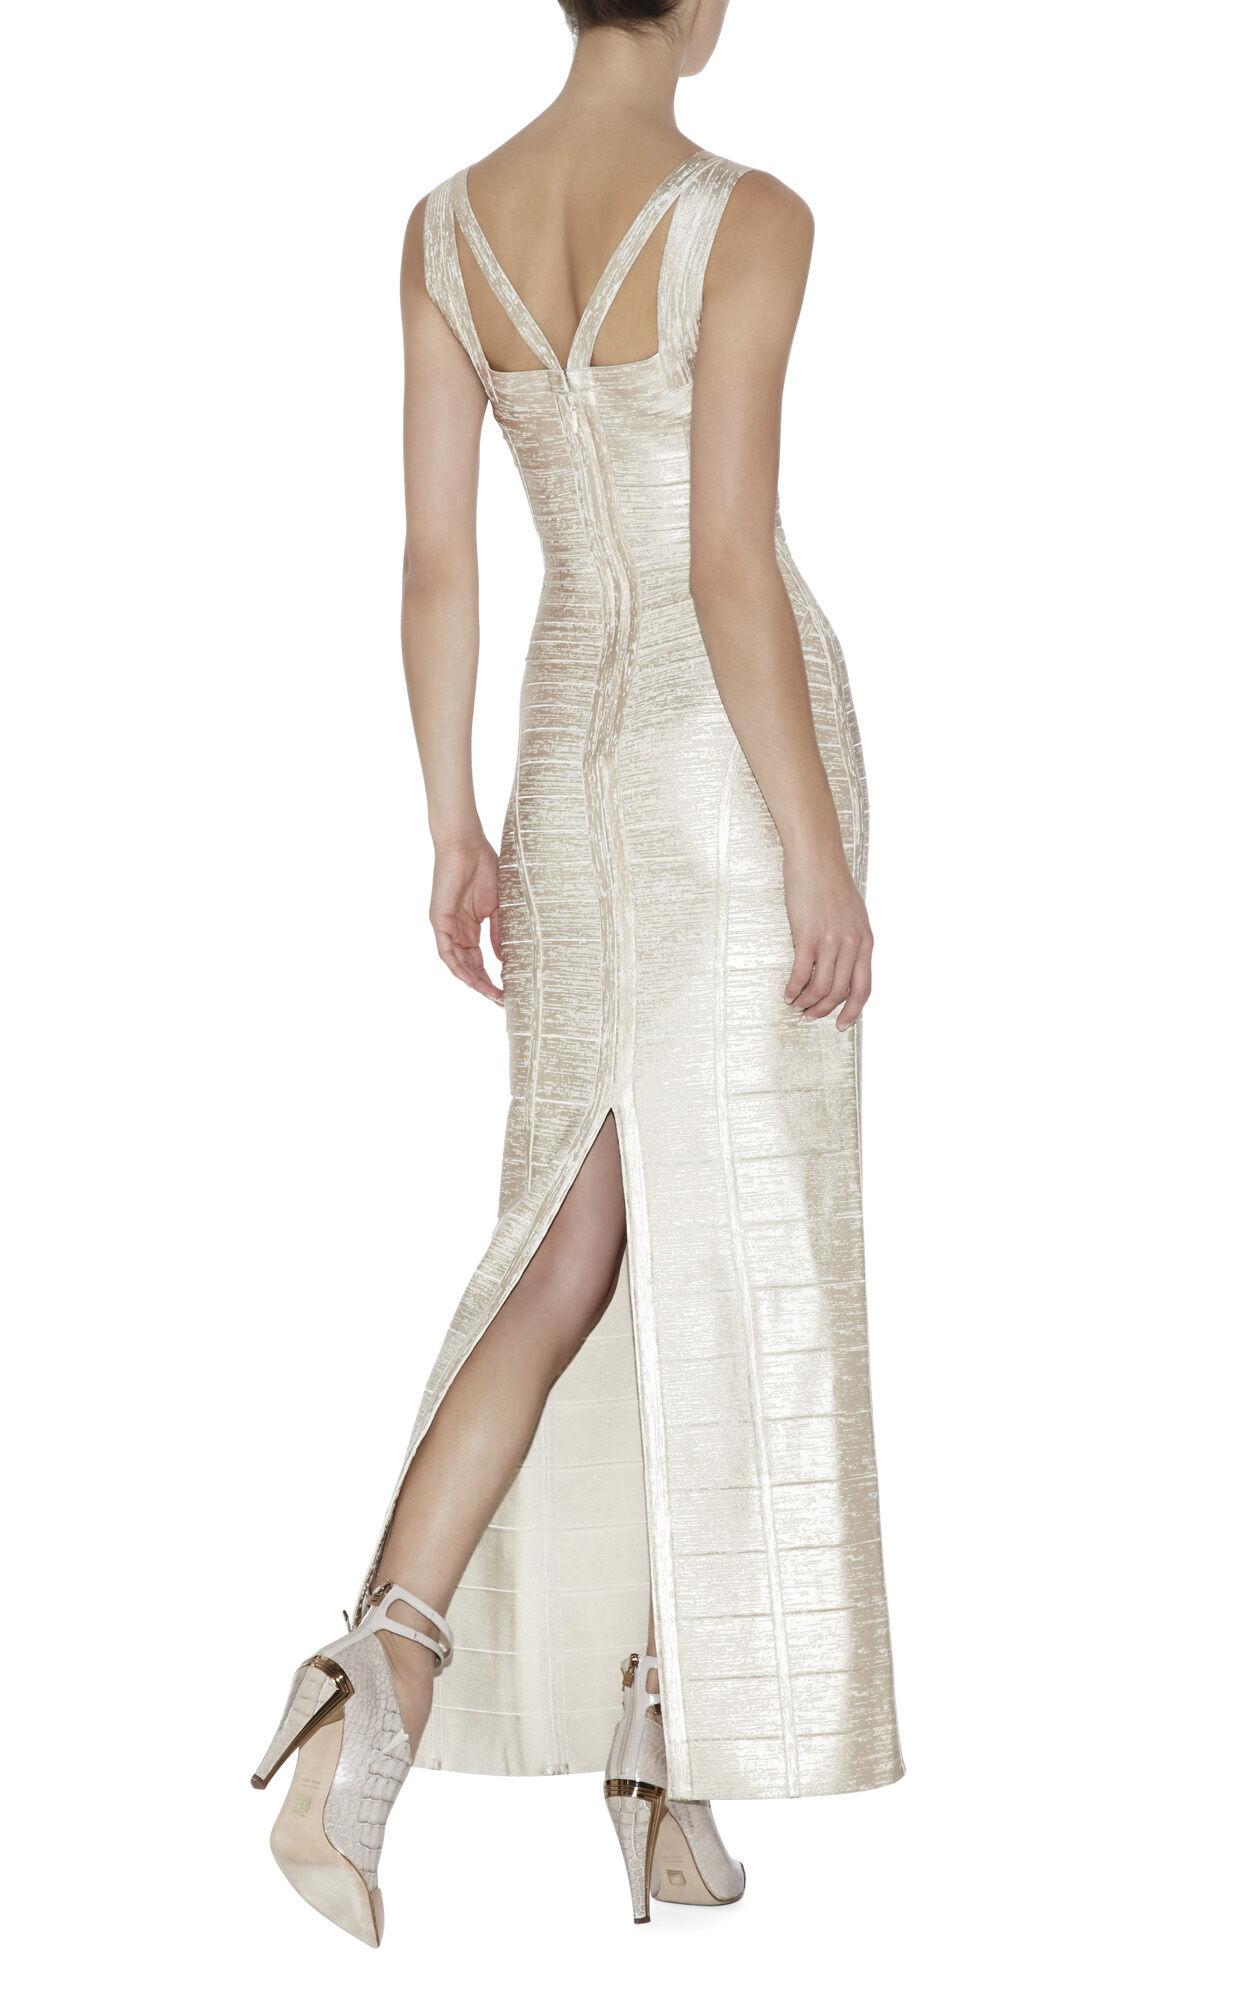 Alenis Woodgrain Foil-Print Dress